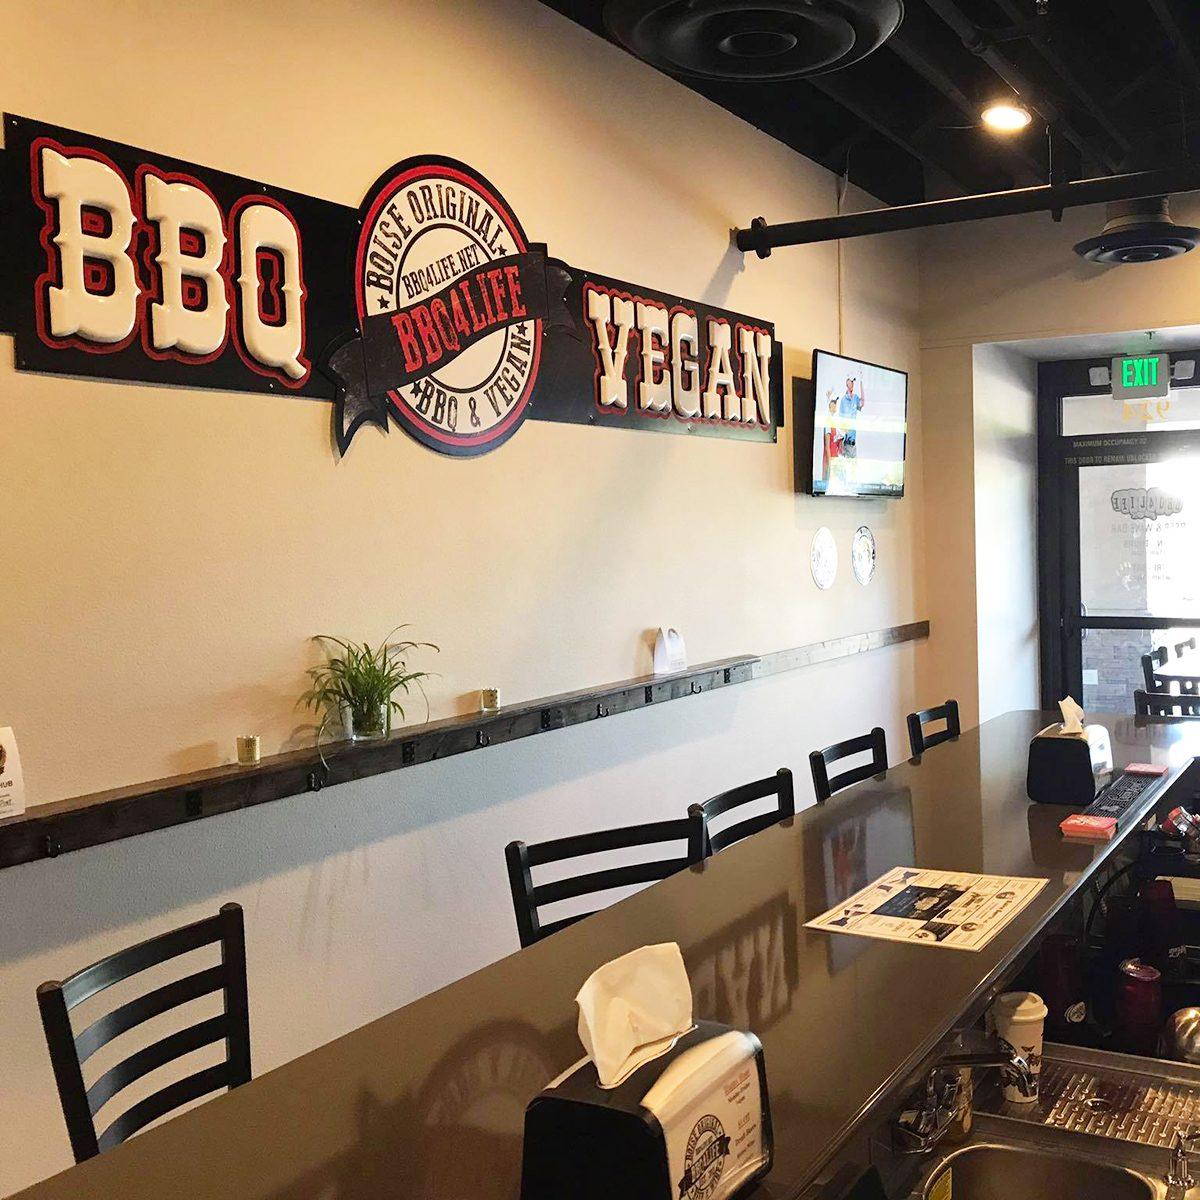 Best vegetarian and vegan restaurant in Idaho BBQ 4 Life